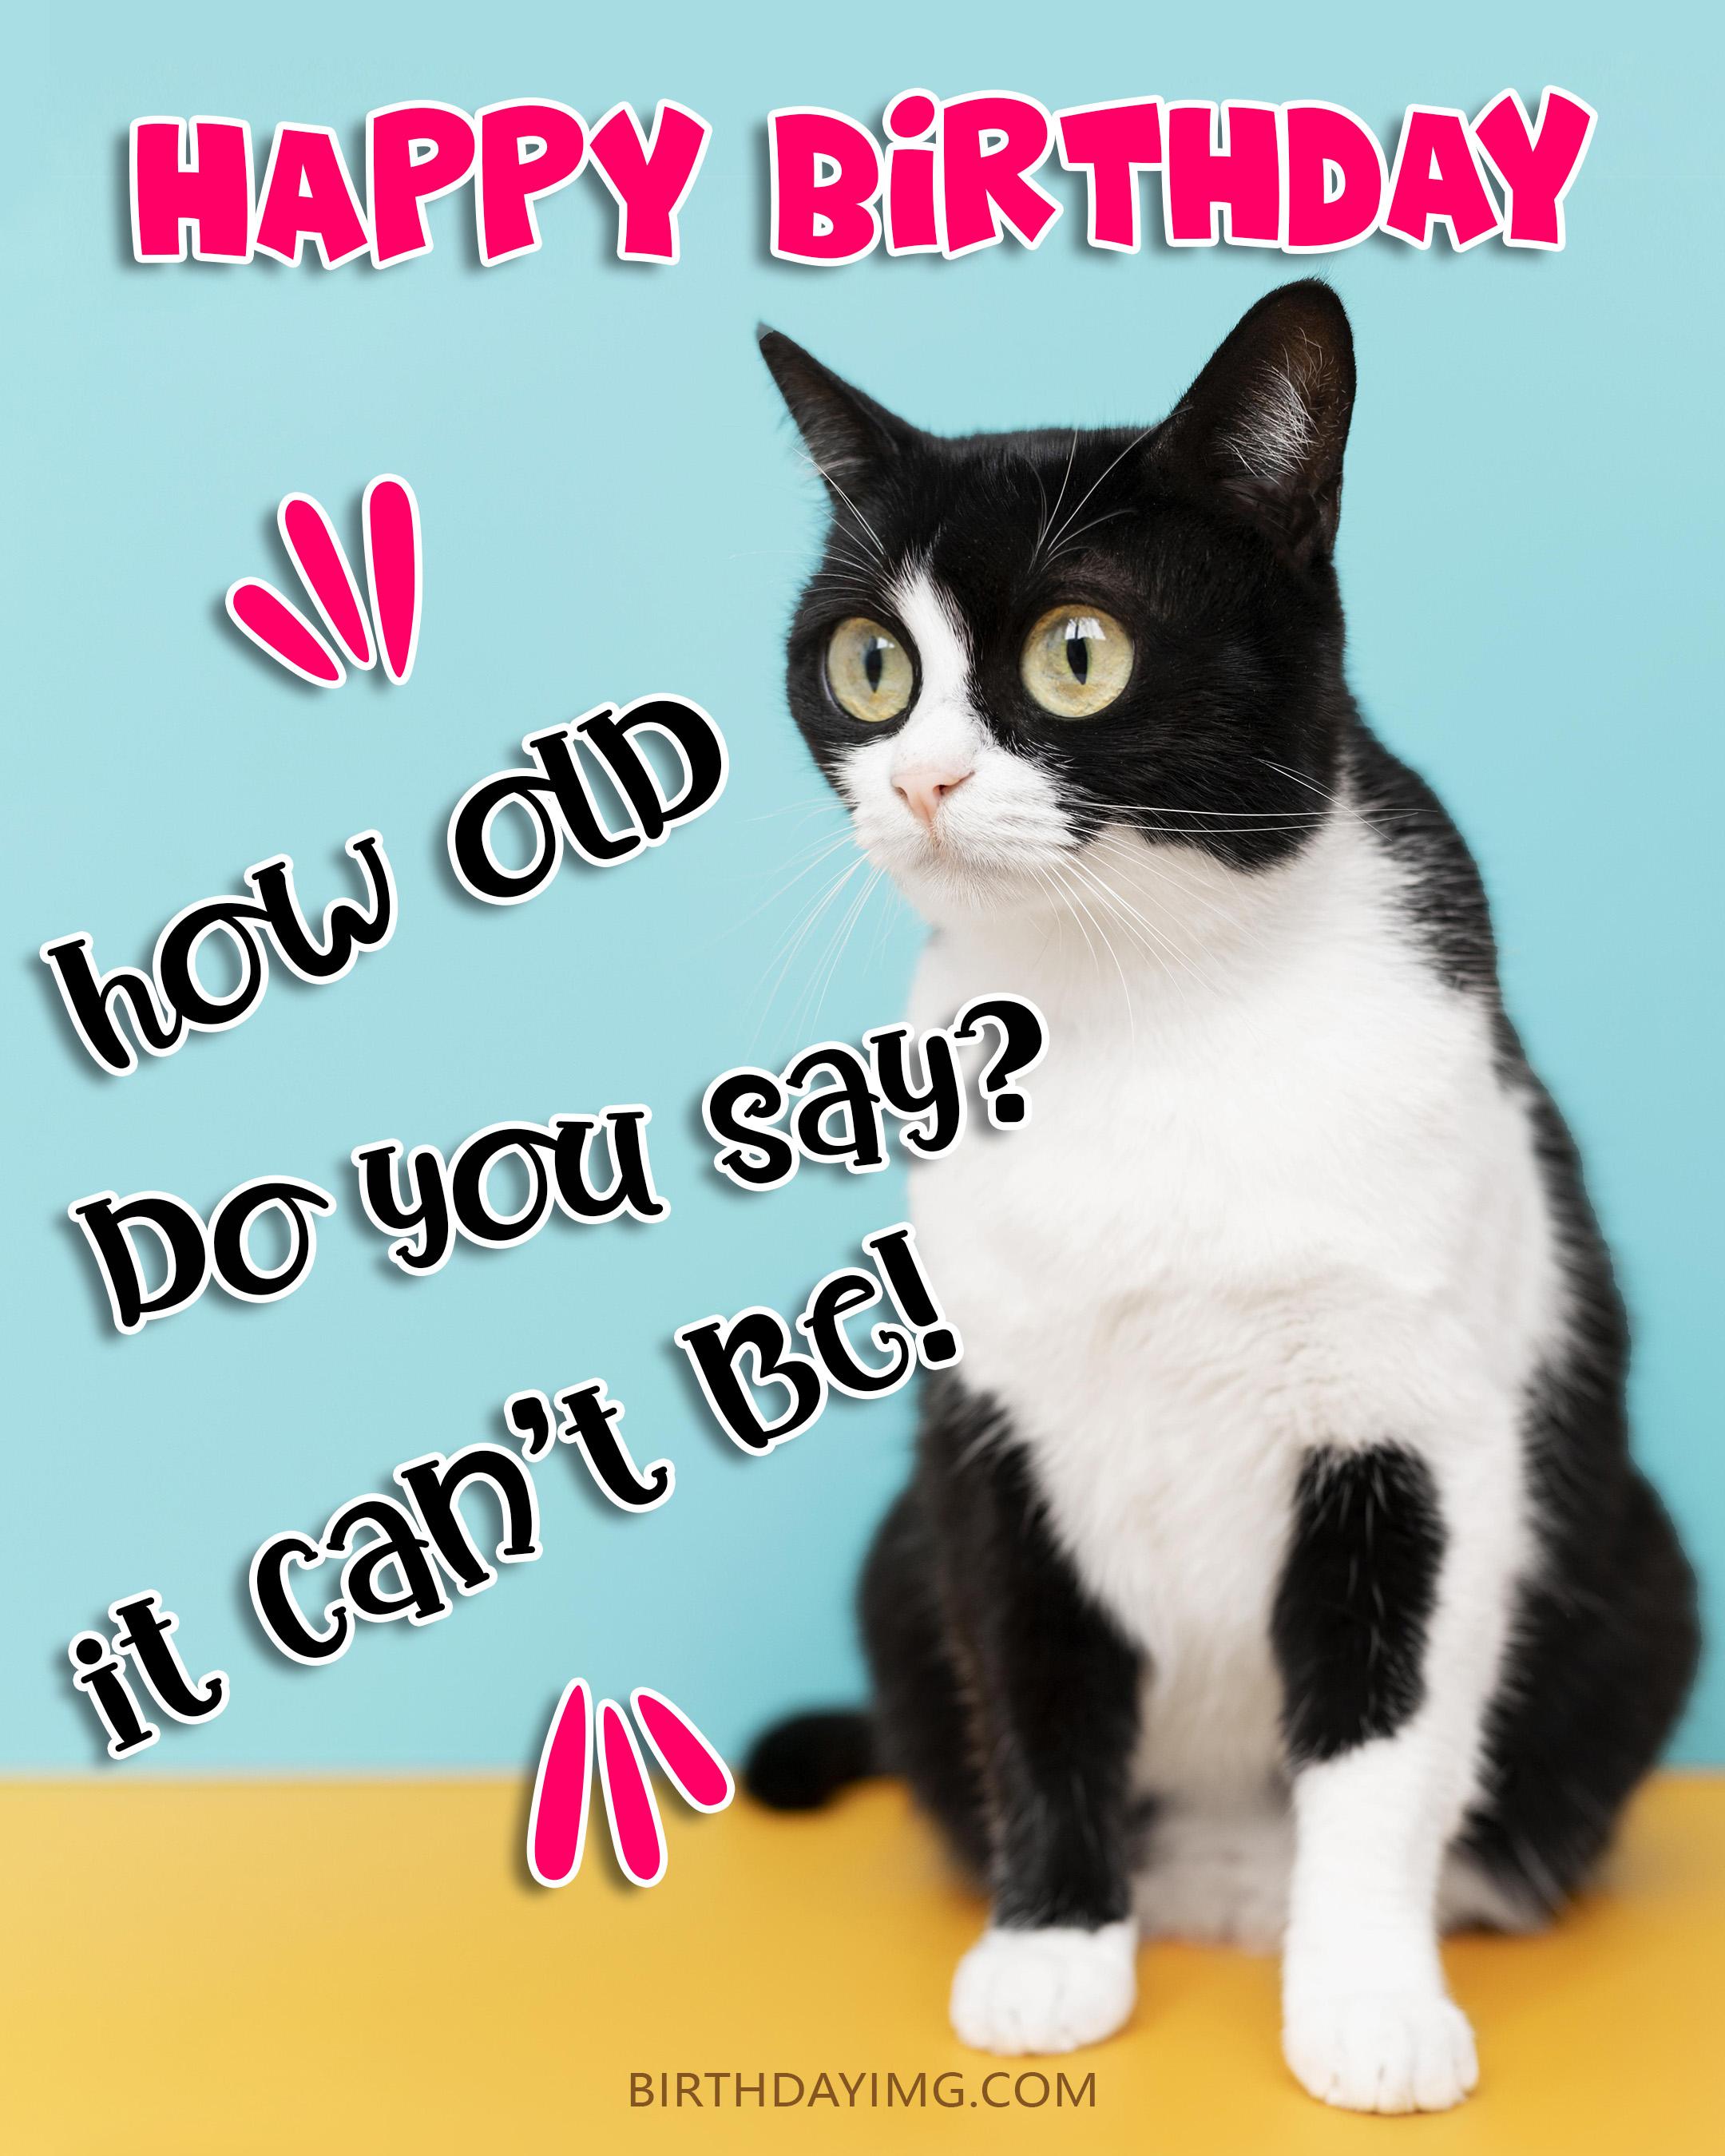 Free Funny Happy Birthday Image With Black and White Cat - birthdayimg.com